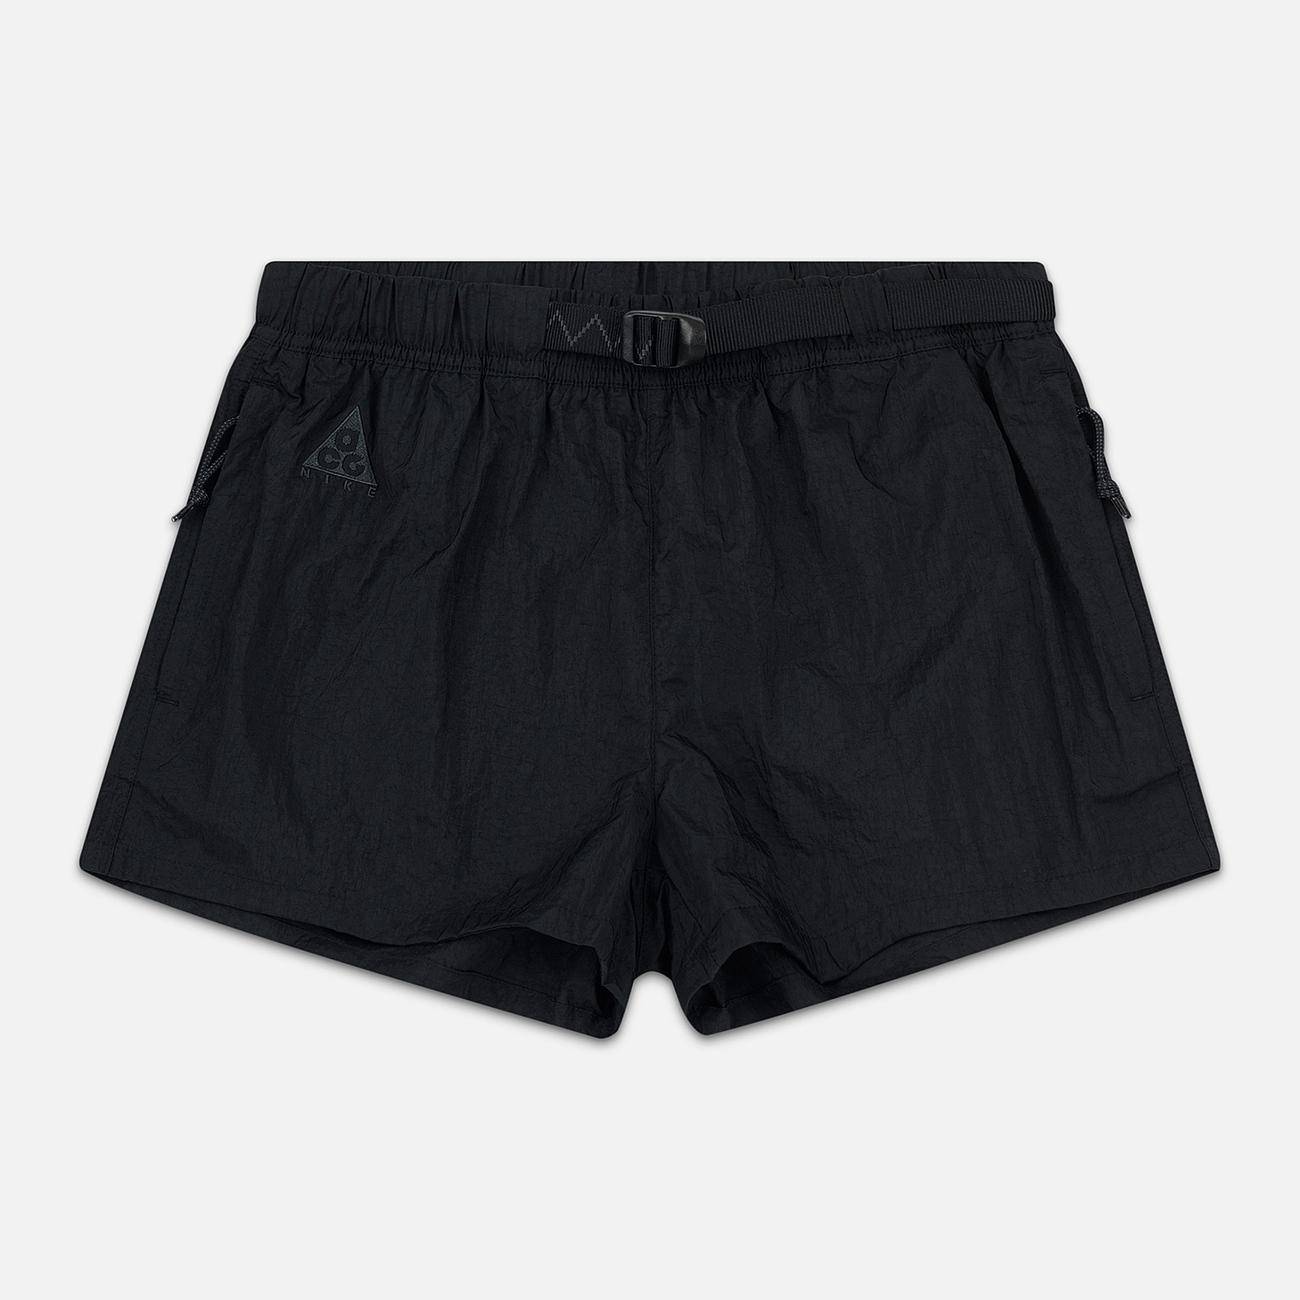 Женские шорты Nike ACG NRG 2 Solid Black/Anthracite